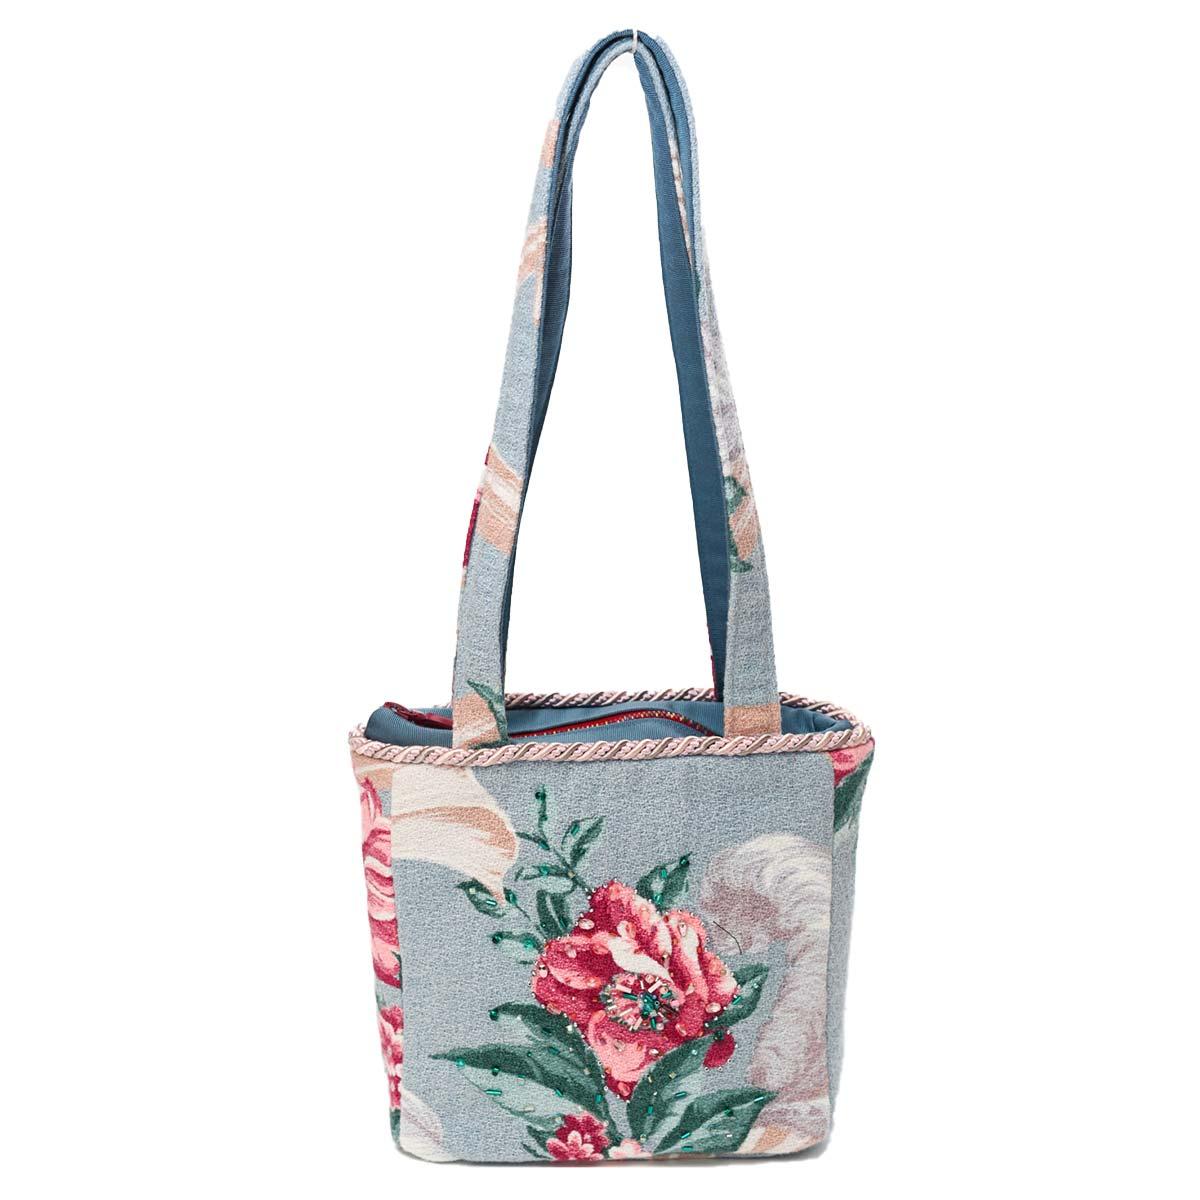 Medium Square Hand-Beaded Bag – Tea Rose on Blue